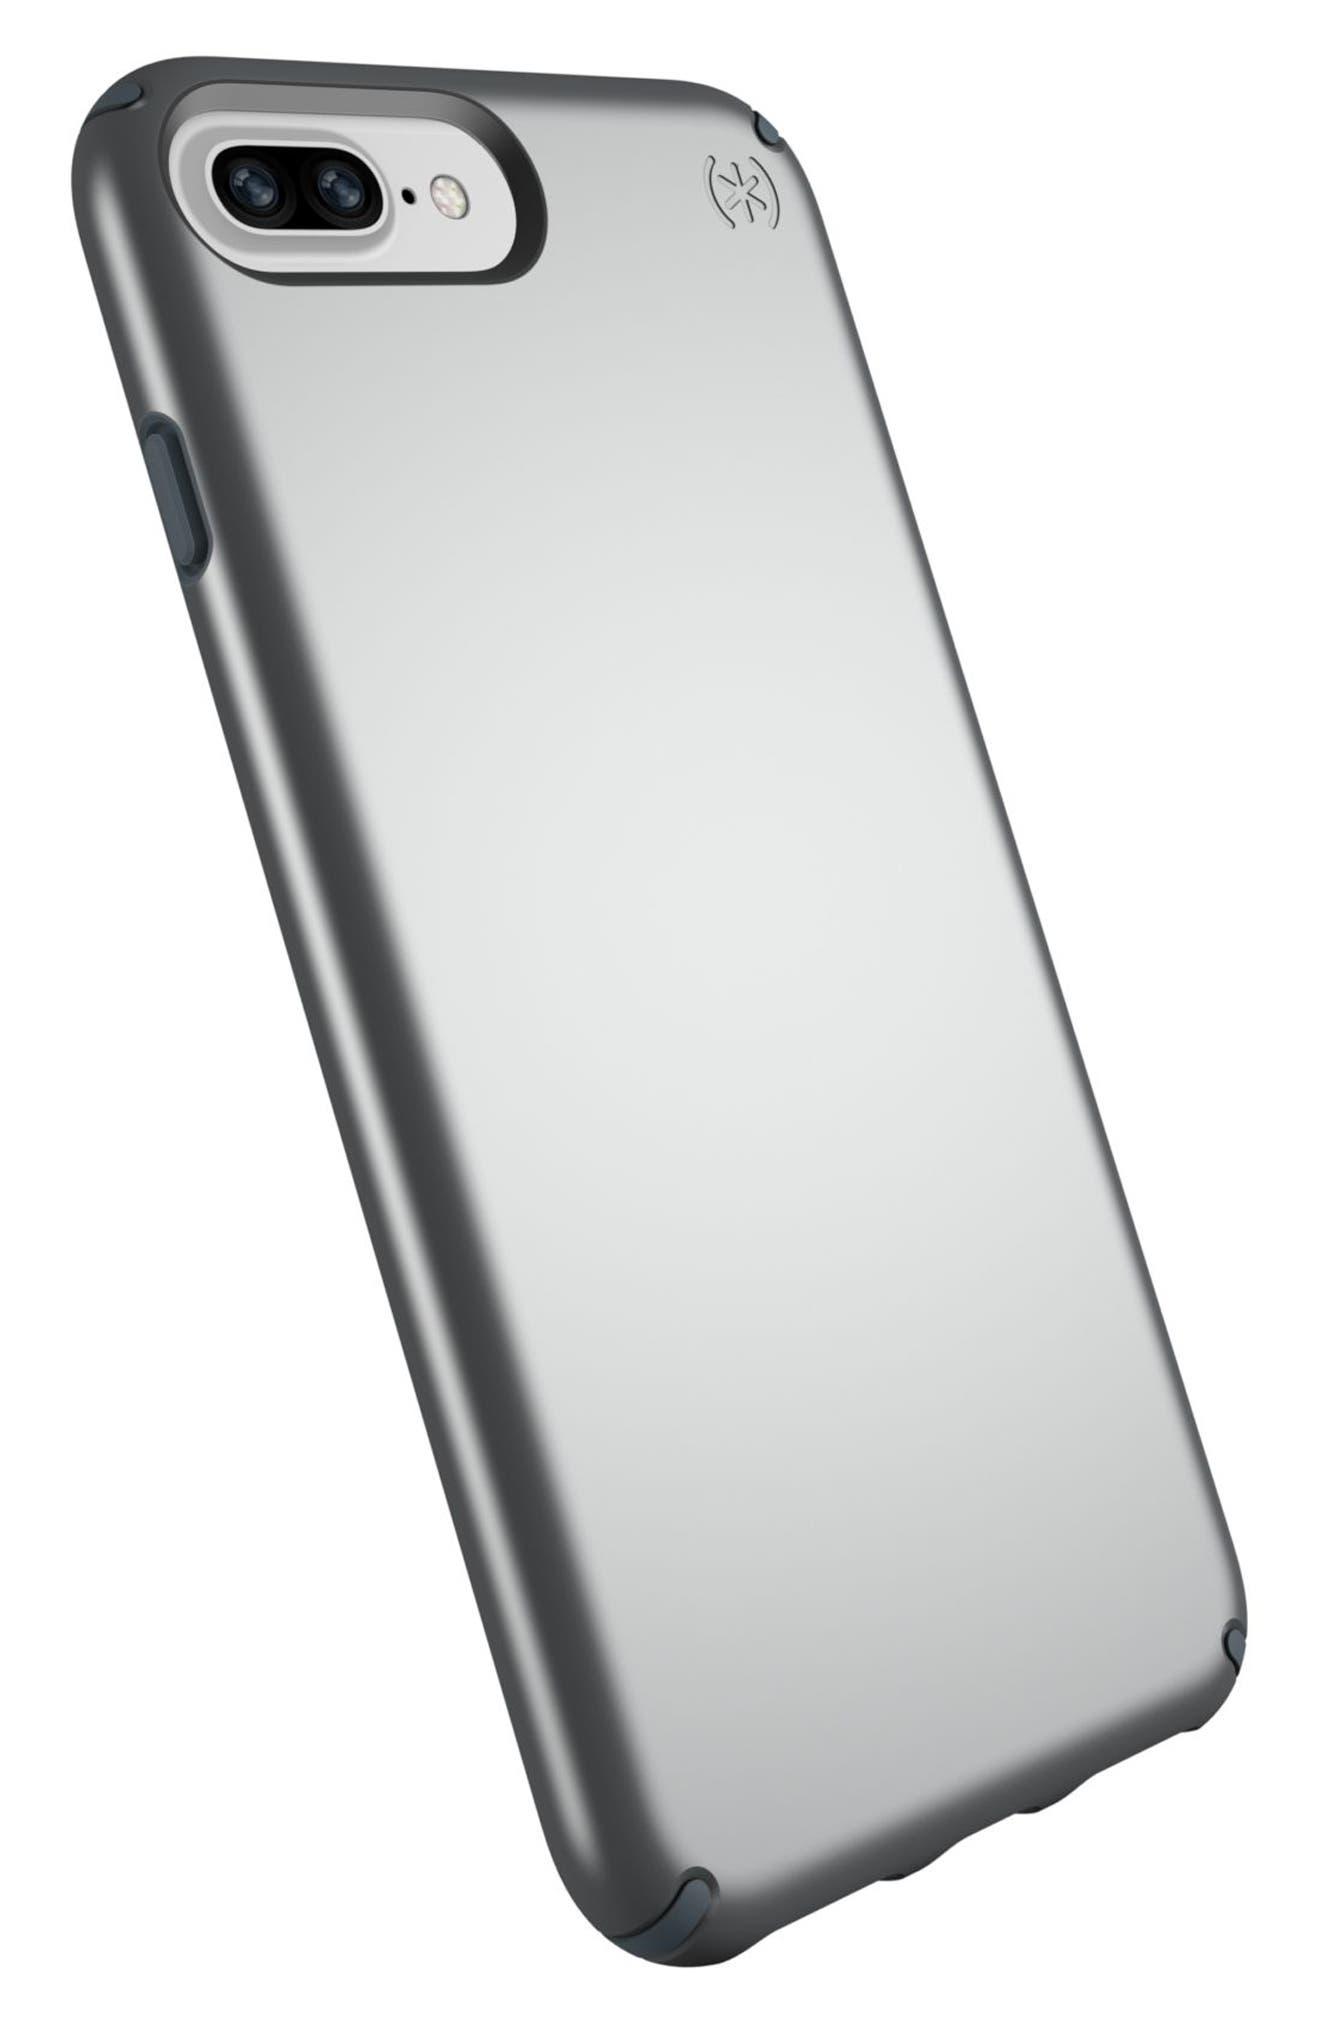 iPhone 6/6s/7/8 Case,                             Alternate thumbnail 3, color,                             Tungsten Grey Metallic/ Grey